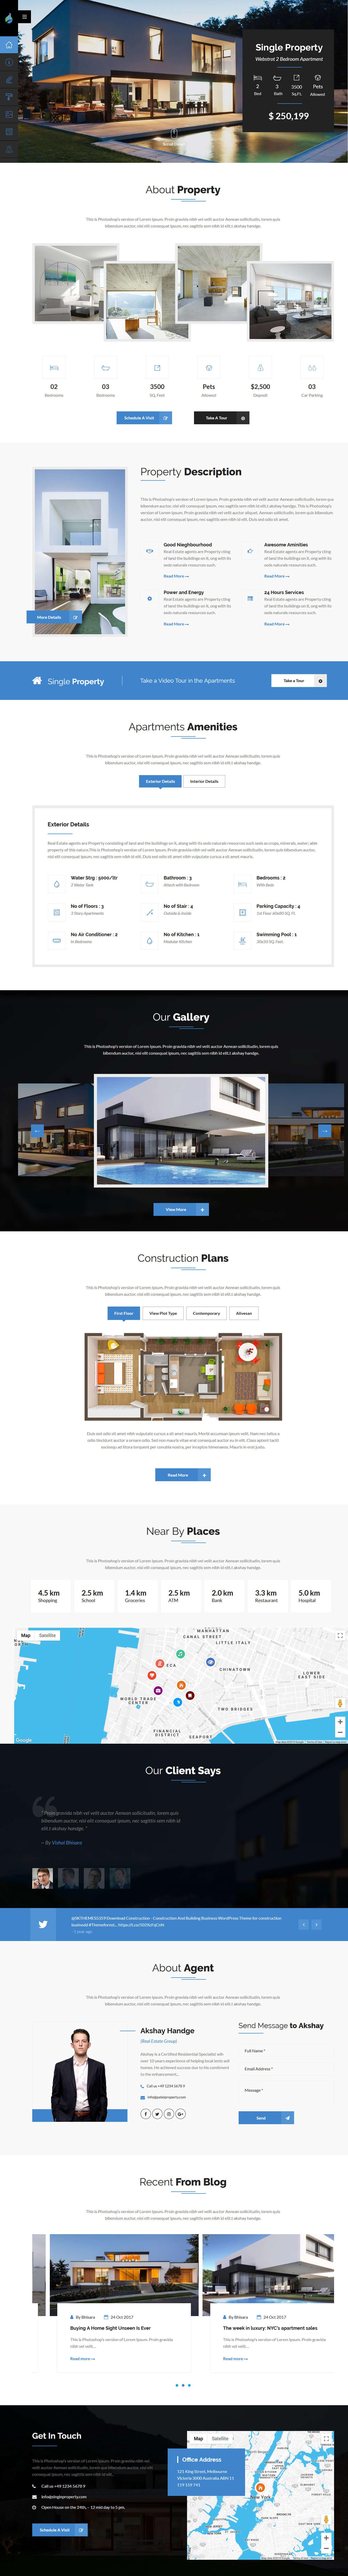 pate property best premium home rental property wordpress theme - 10+ Best Premium Home Rental and Property WordPress Themes